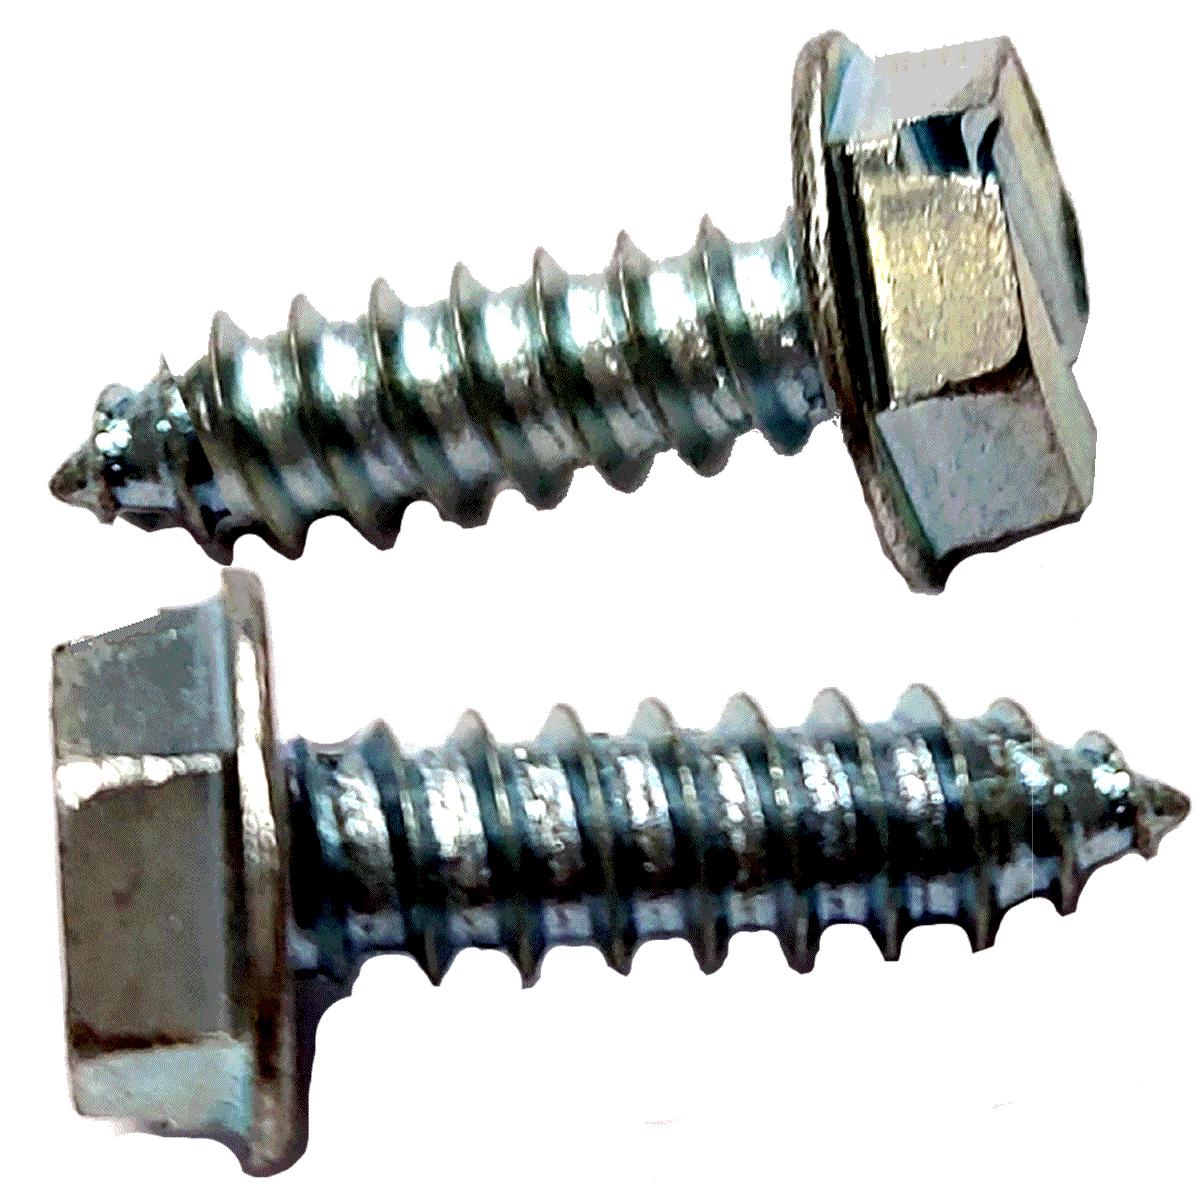 Parafuso Rosca Soberba 4,8x16 mm Sextavado 8 mm com fenda